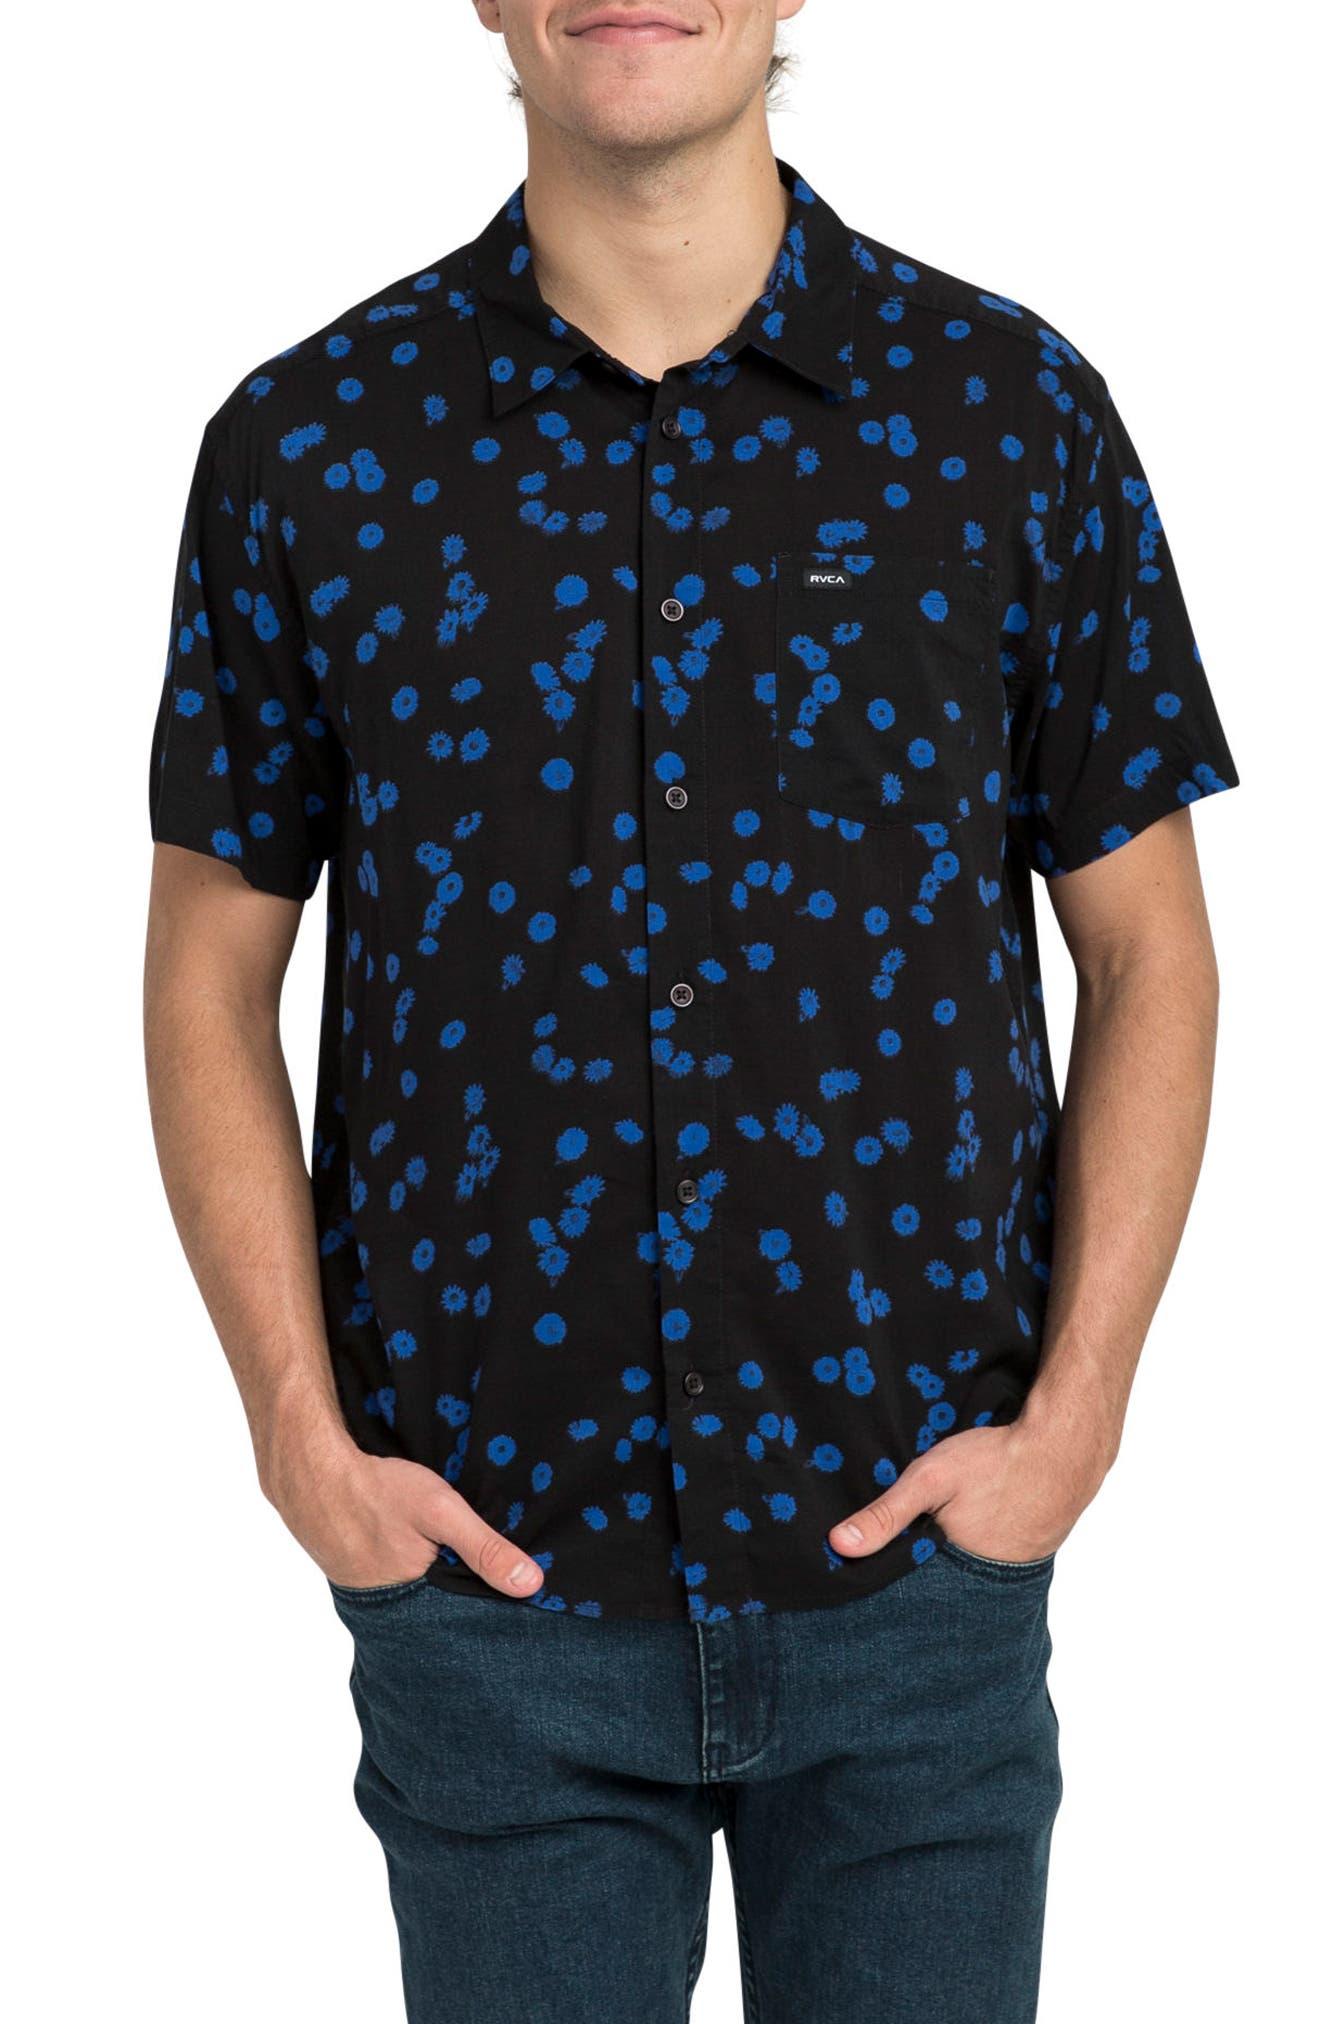 Overdye Floral Shirt,                             Main thumbnail 1, color,                             001